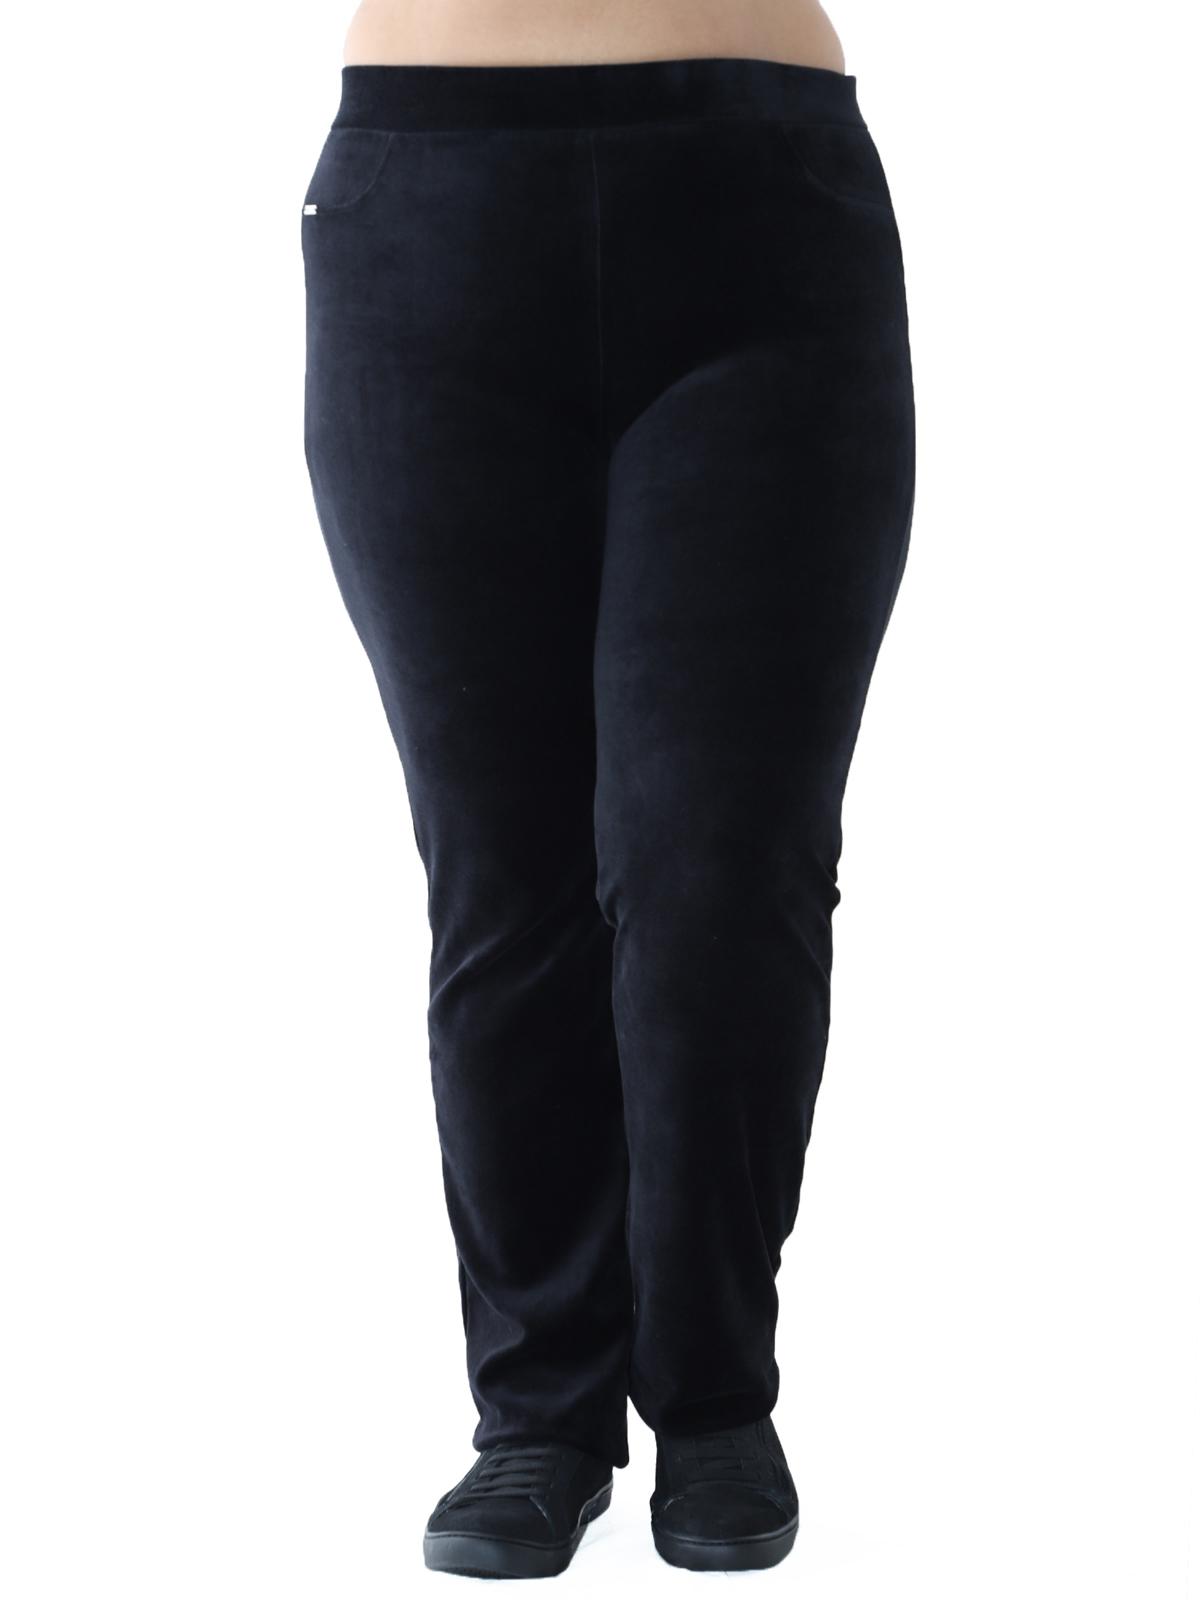 Calça Plus Size Feminina de Plush Preta